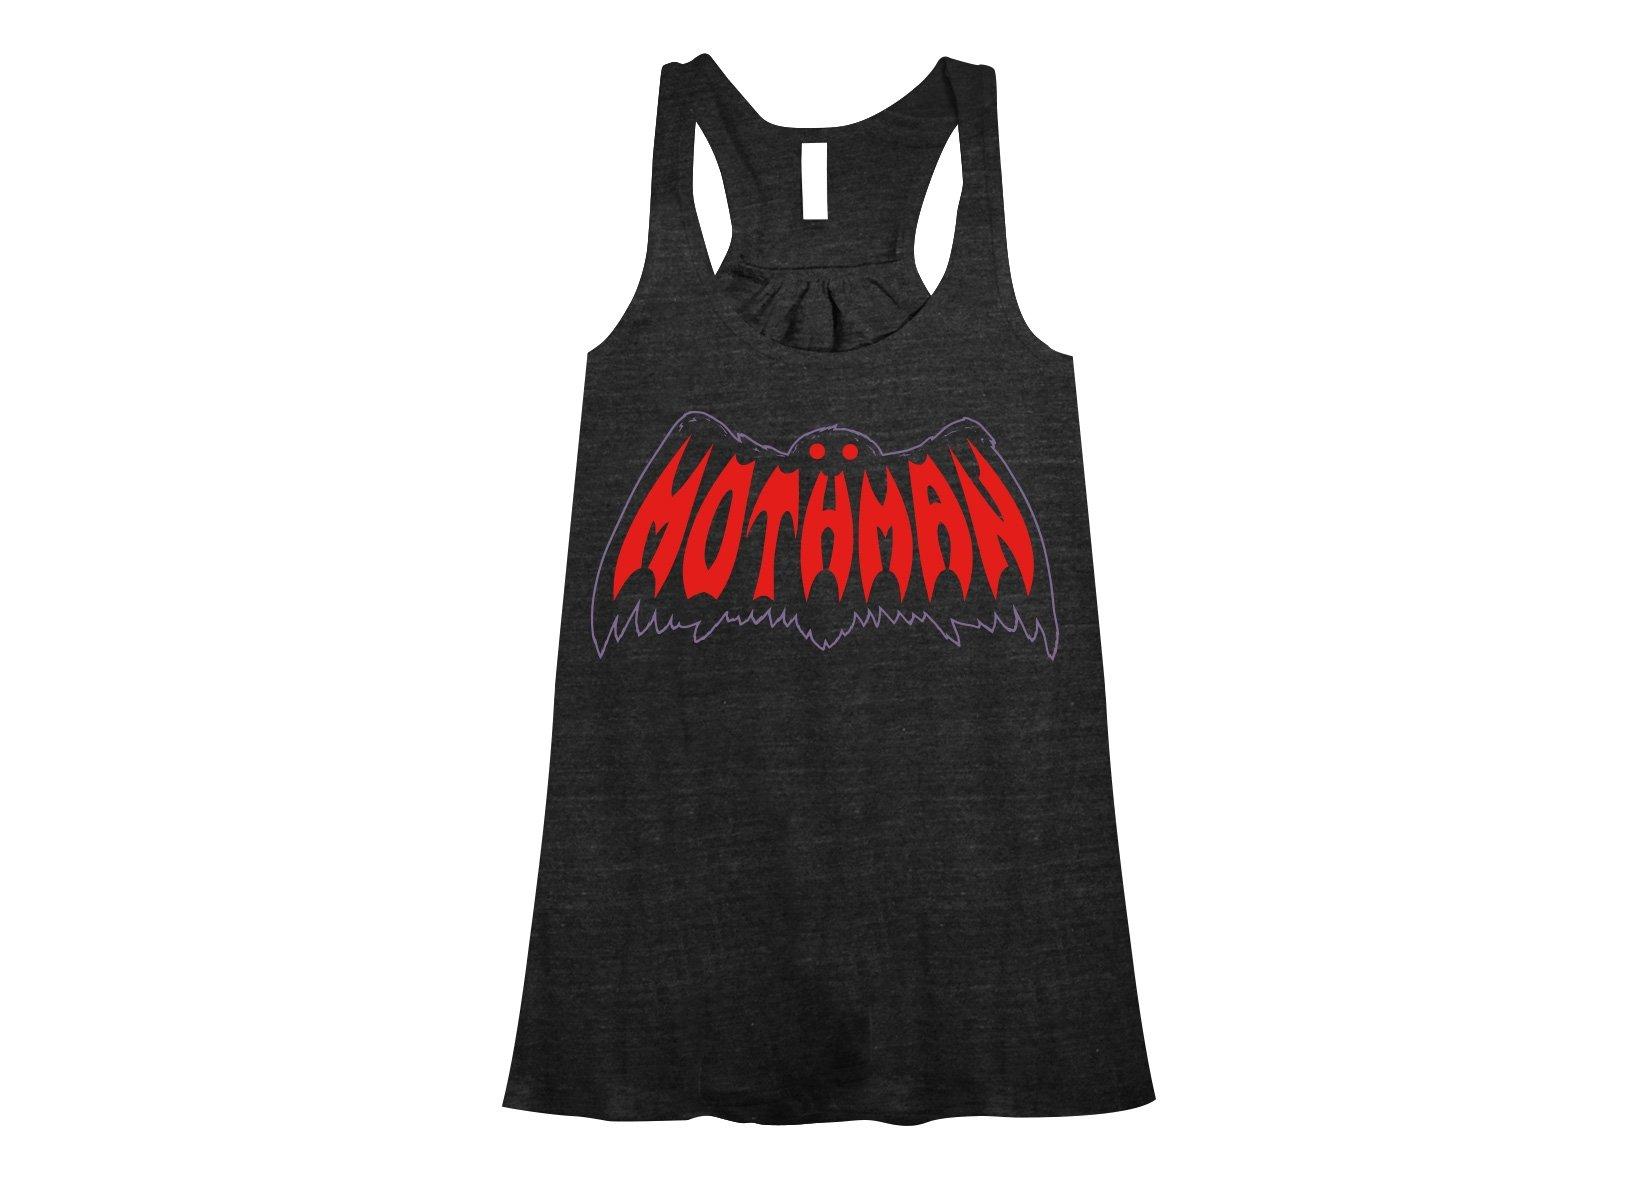 Mothman on Womens Tanks T-Shirt